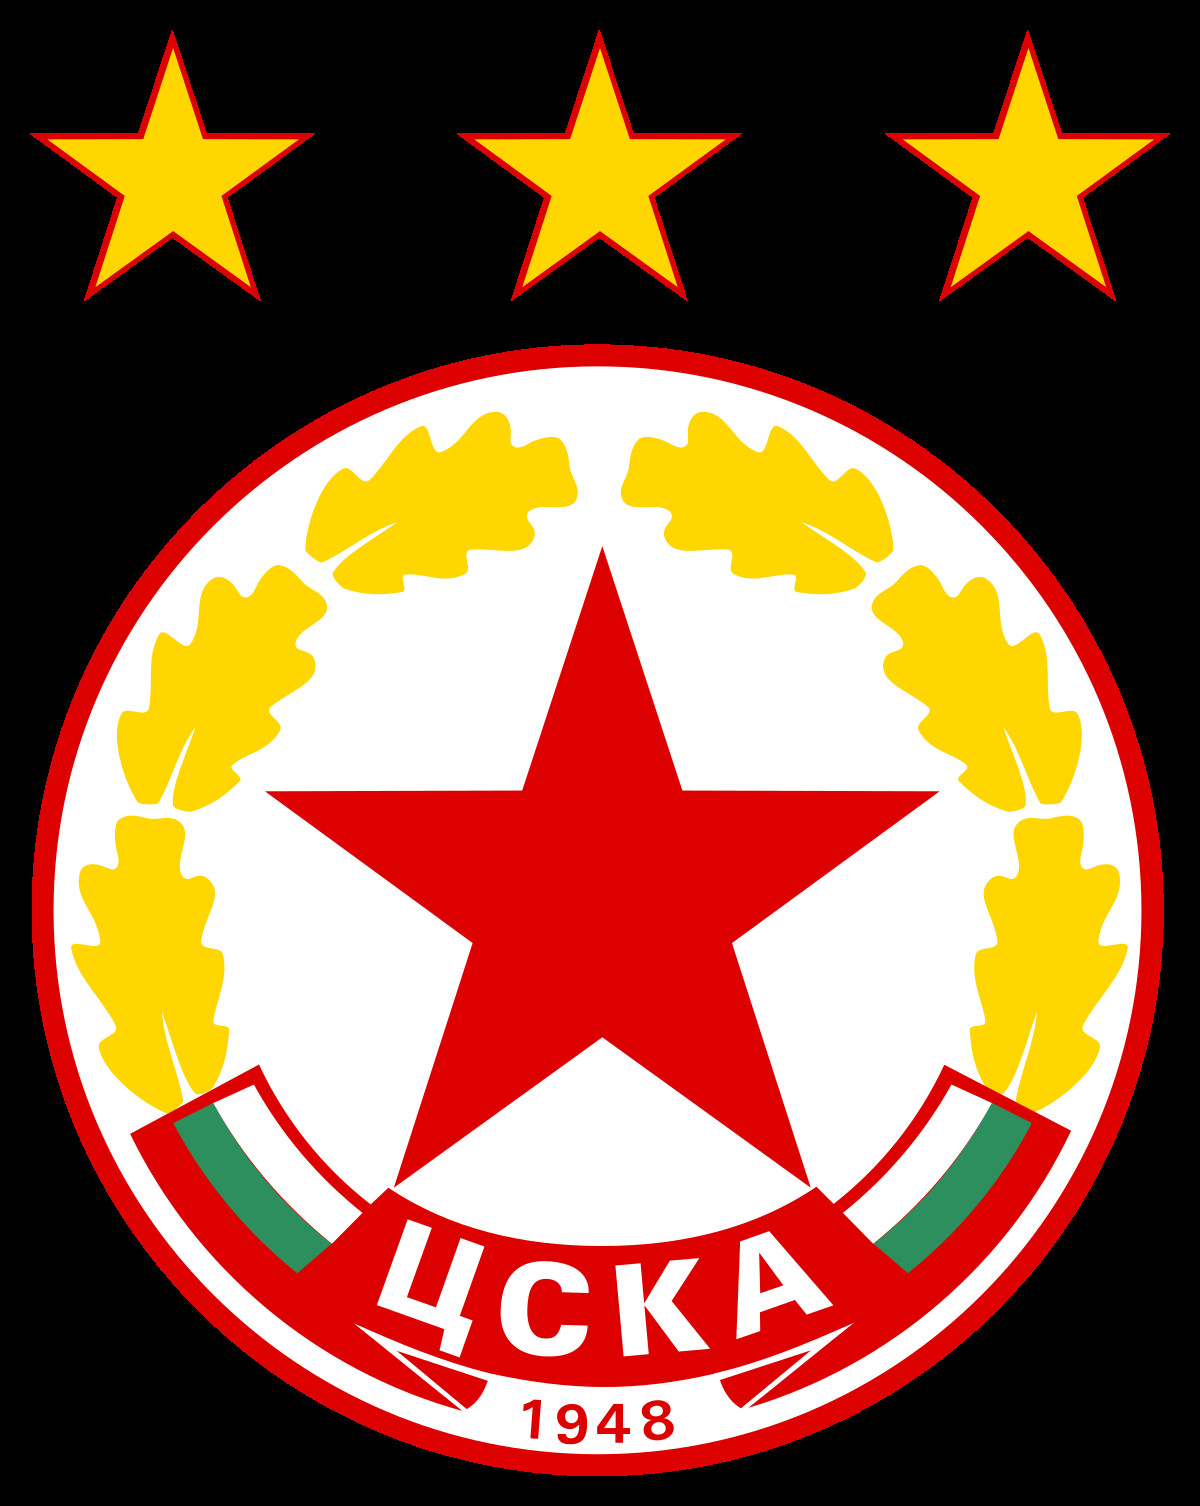 Fc Bayern Logo Zum Ausdrucken Einzigartig Zska sofia – Bild